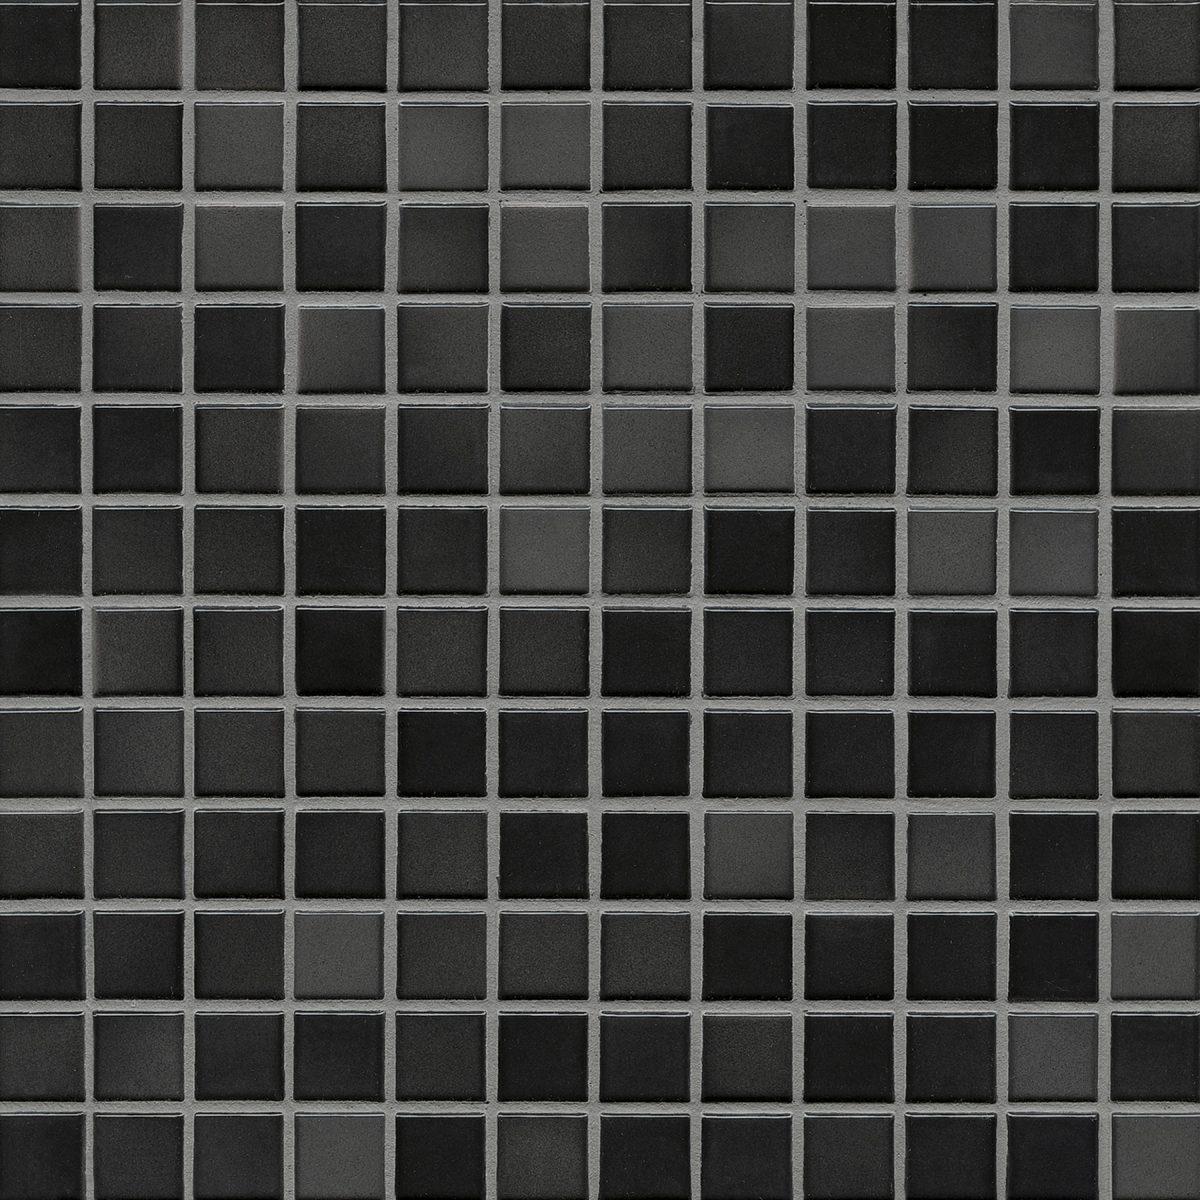 Мозаика серия Fresh 2,4 X 2,4 см Midnight Black Mix Glossy (глазурованная)